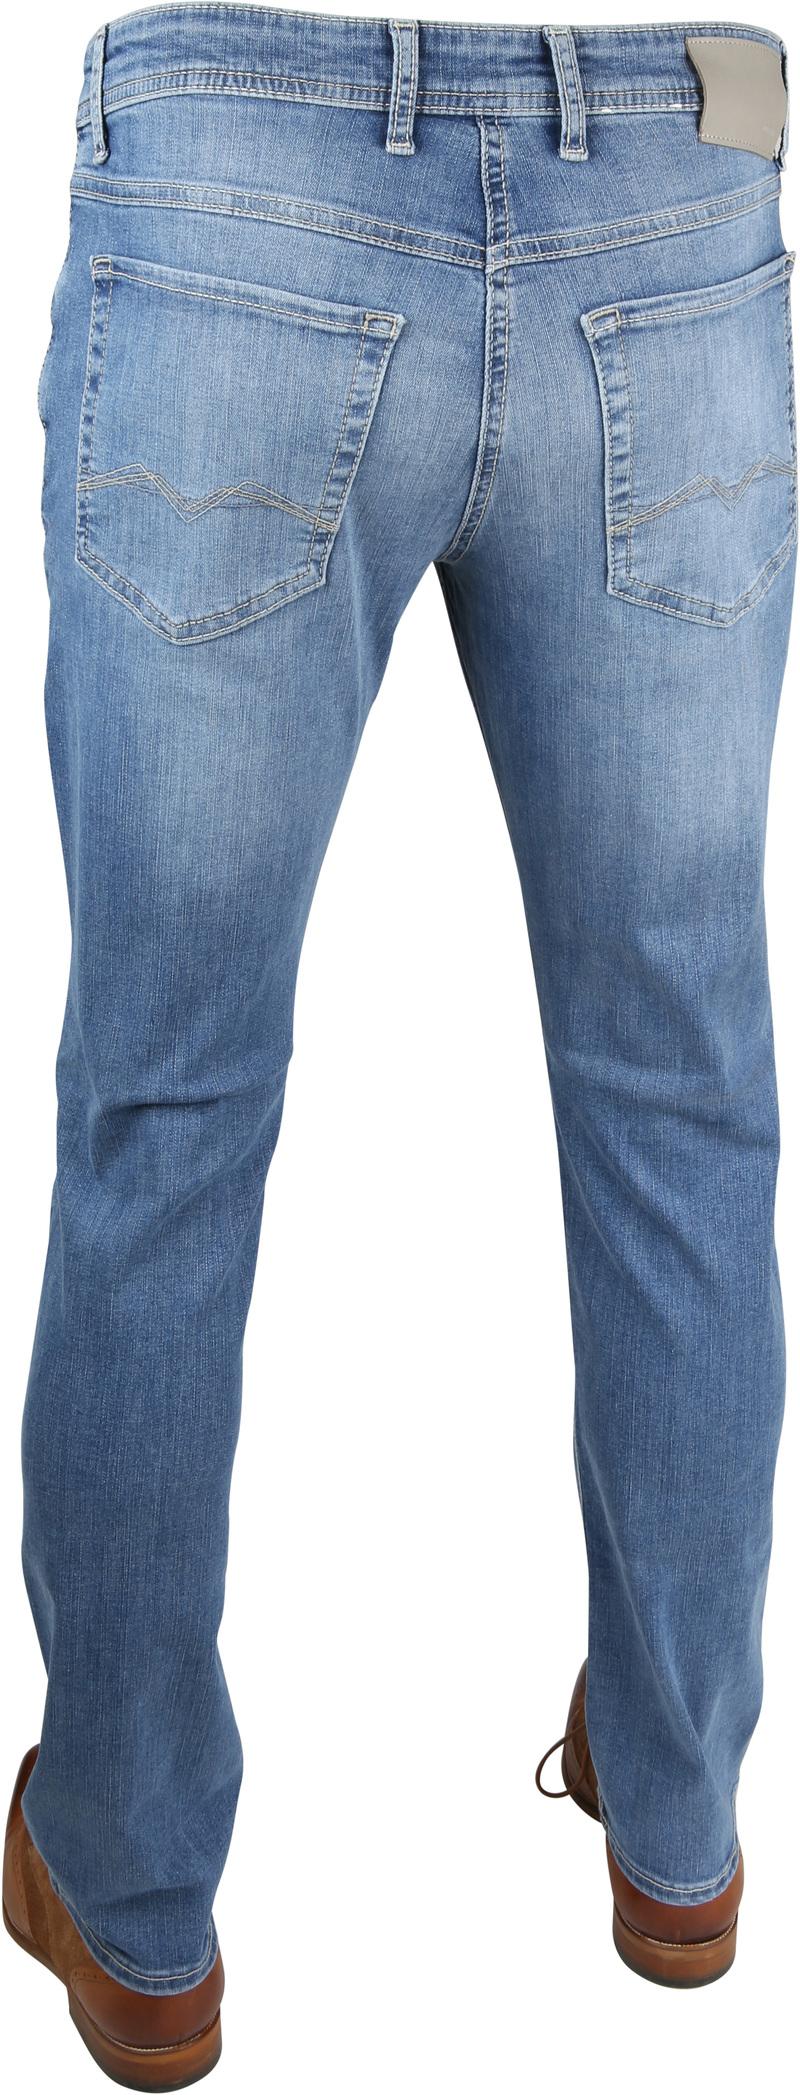 Mac Jeans MacFlexx Modern Fit H447 photo 3